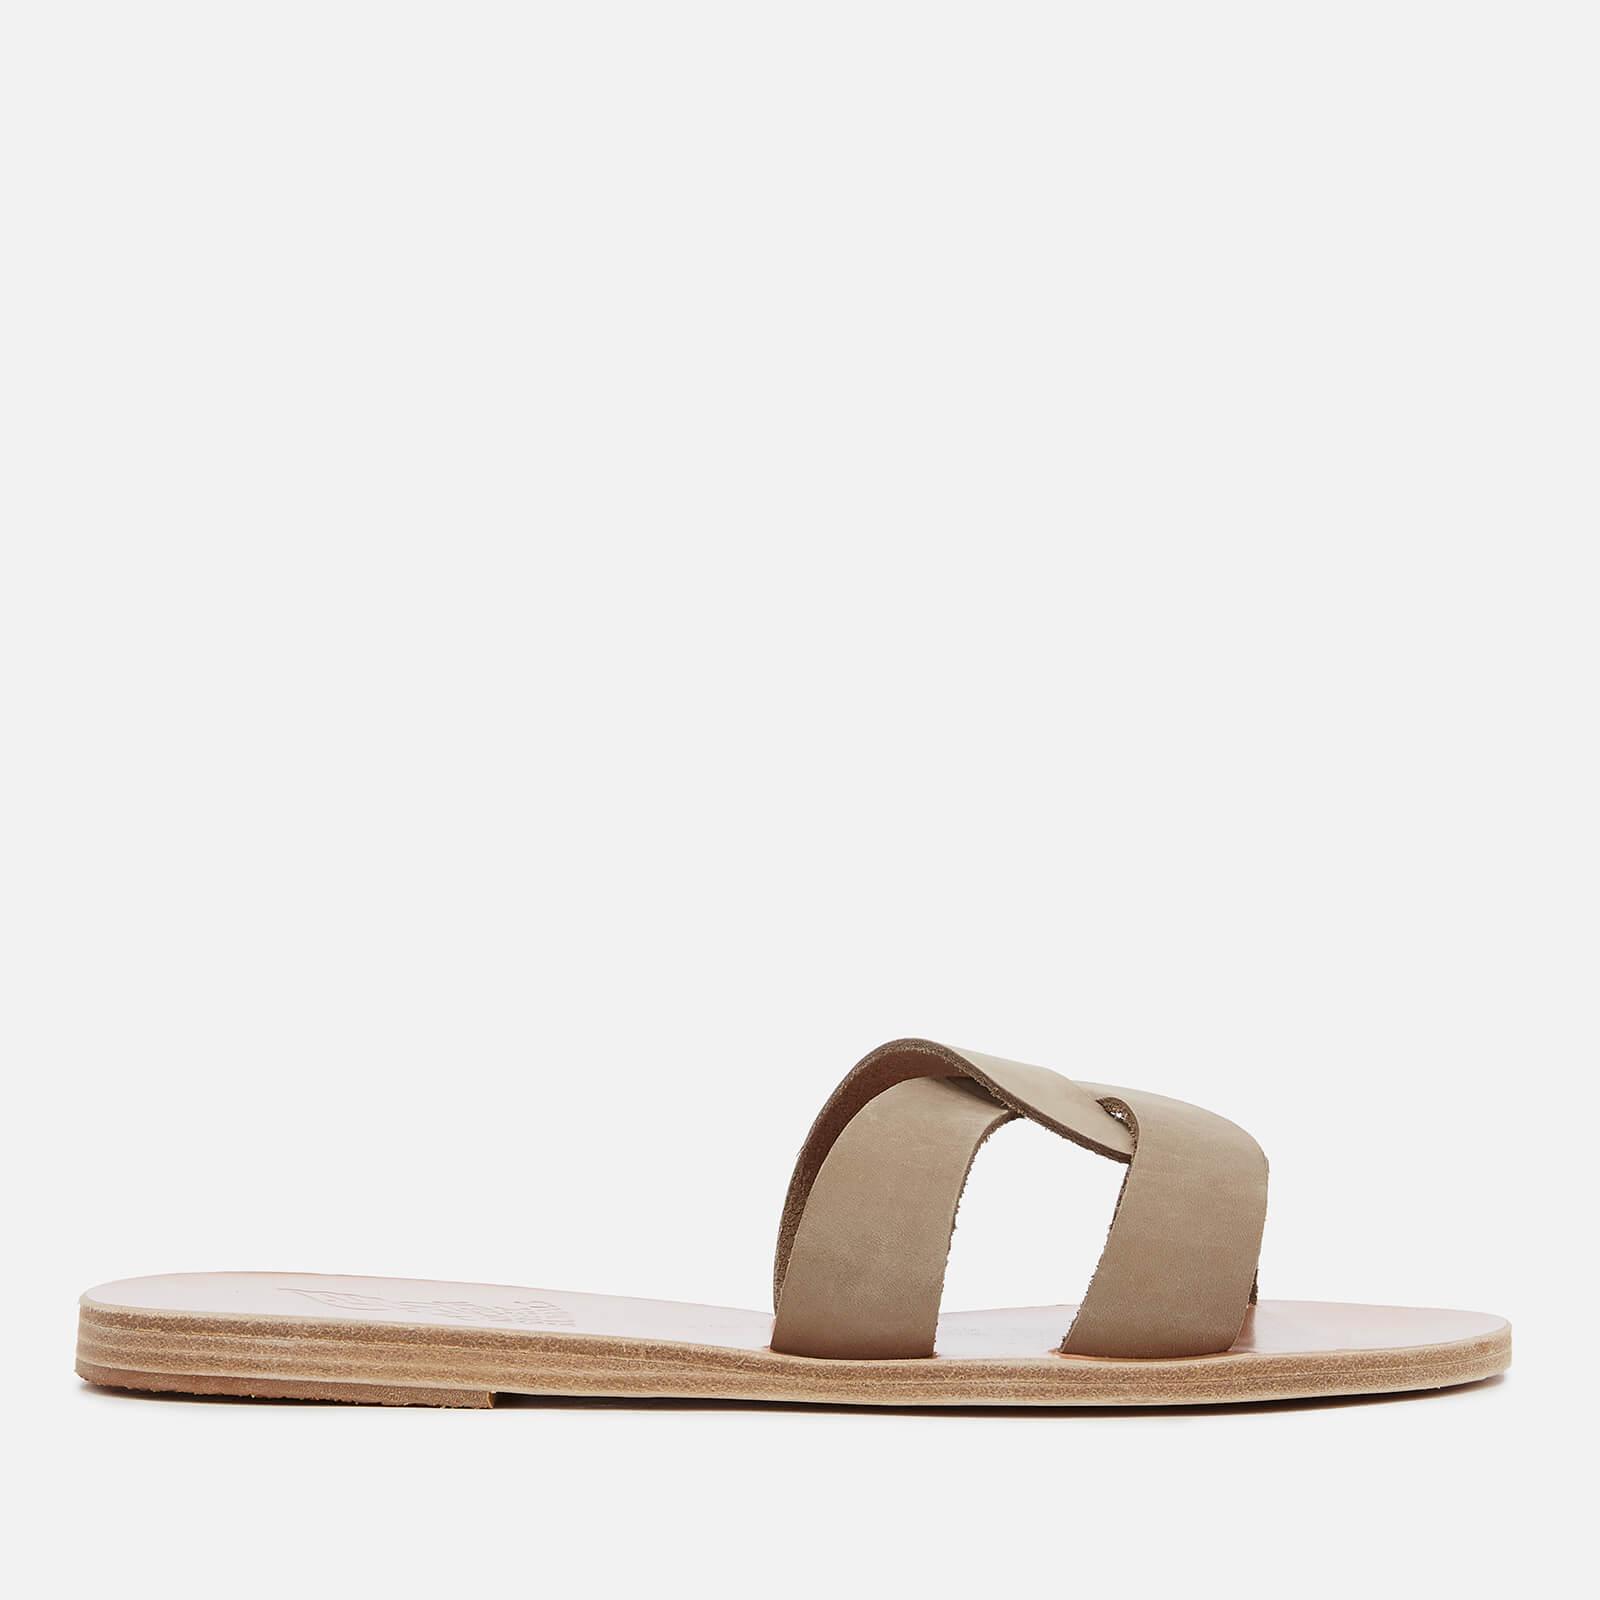 93b06d9d8961a ... Ancient Greek Sandals Women's Desmos Nubuck Slip On Sandals - Canapa